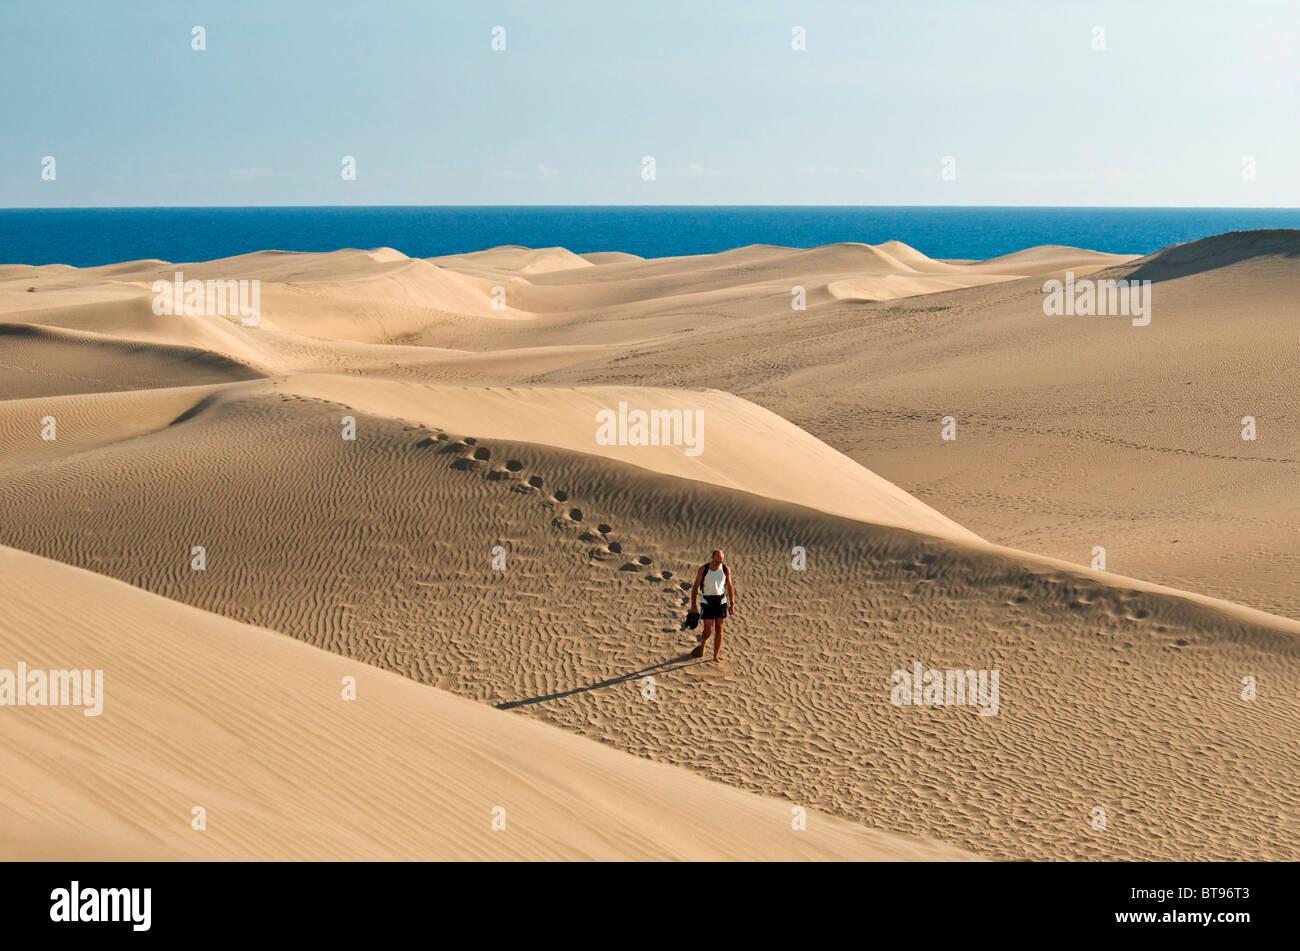 Sand dunes of Maspalomas, Gran Canaria, Canary Islands, Spain, Europe - Stock Image